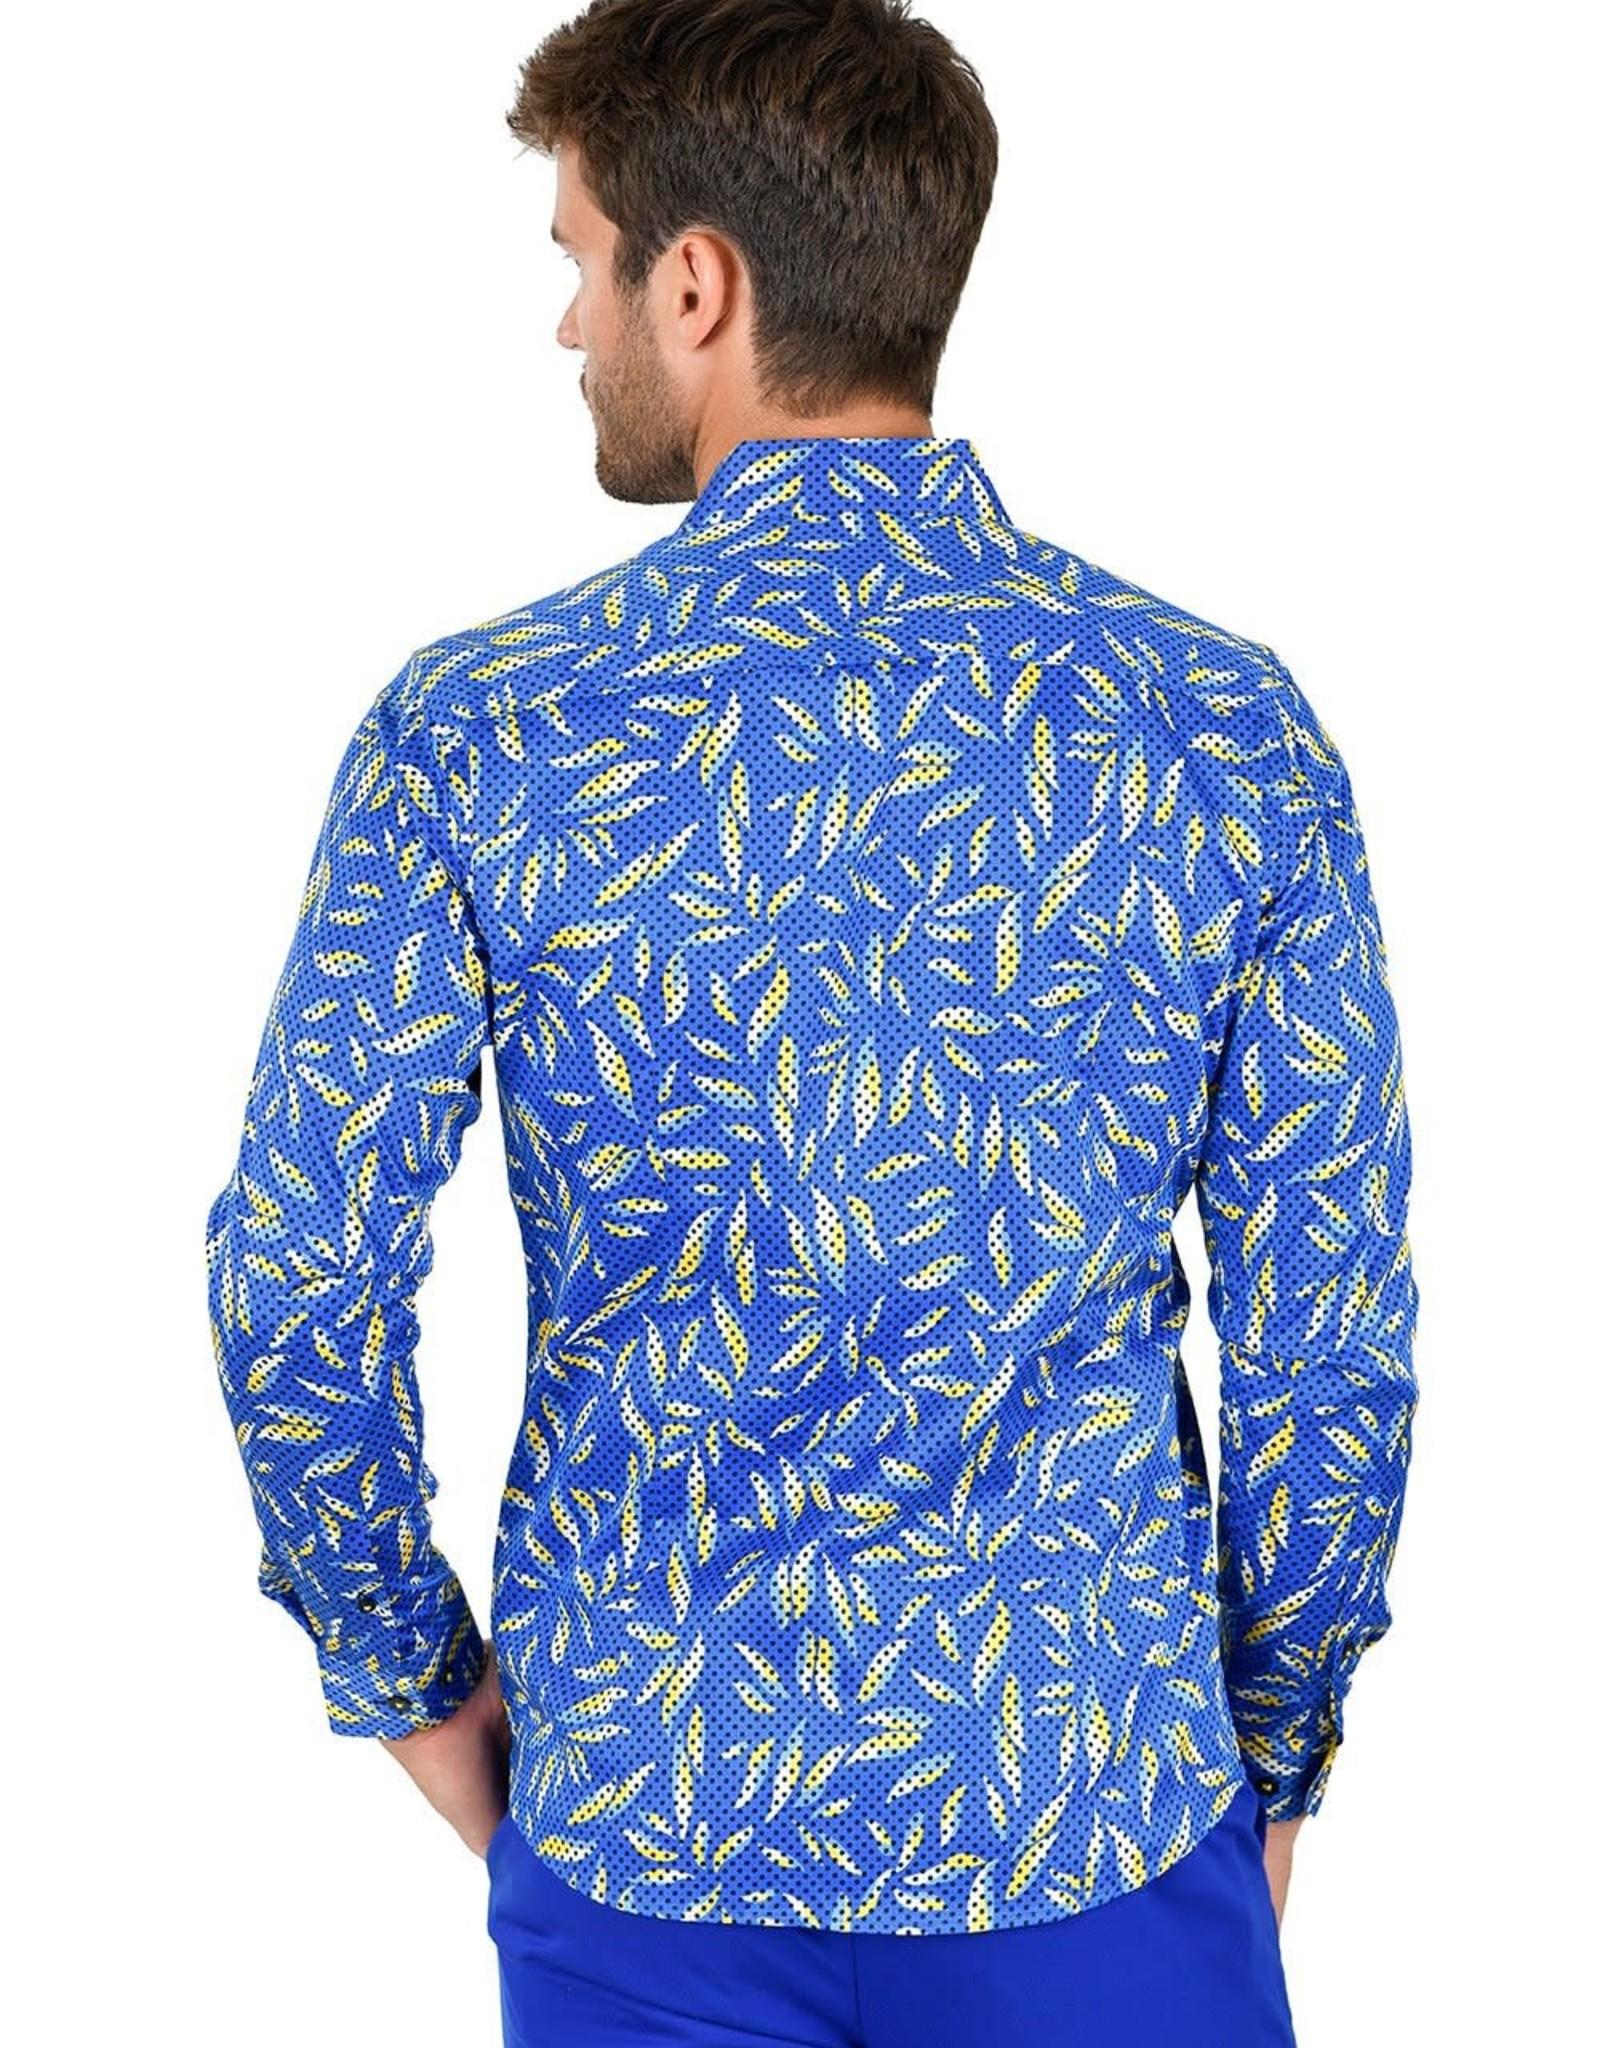 Barabas Charming Breeze Shirt